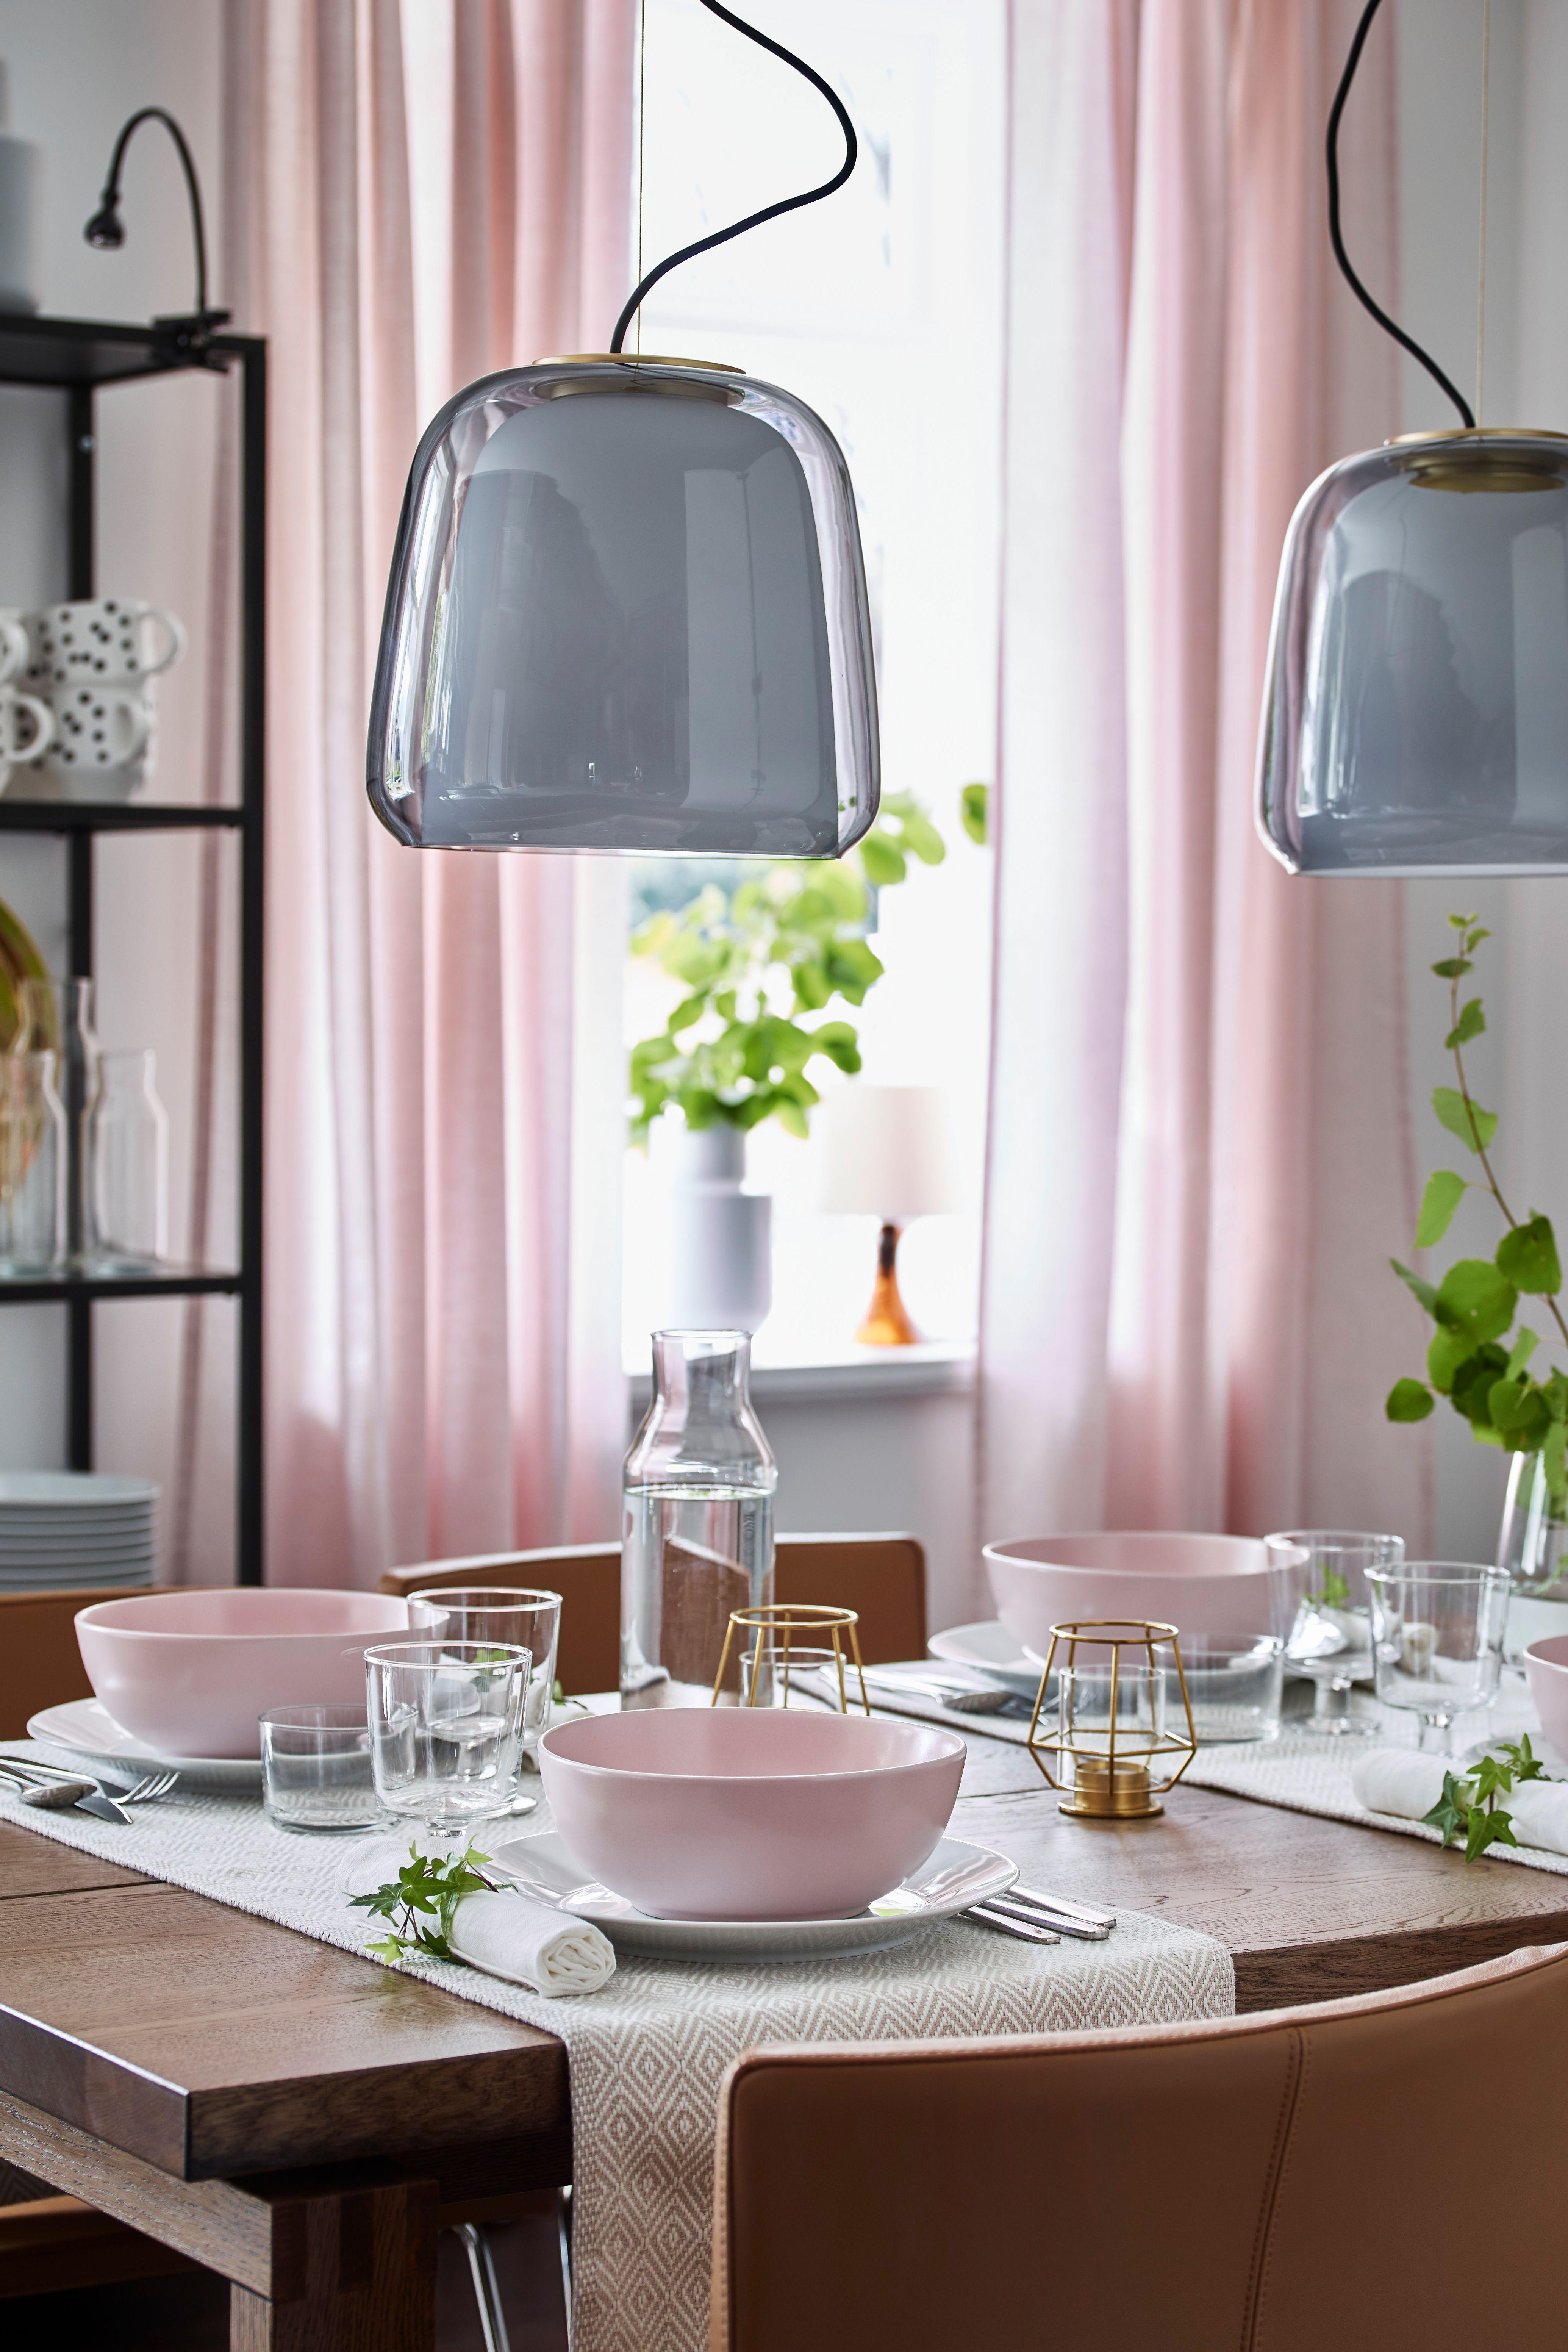 Evedal Hängeleuchte Grau Ikea Deutschland Anhänger Lampen Esszimmerleuchten Ikea Inspiration